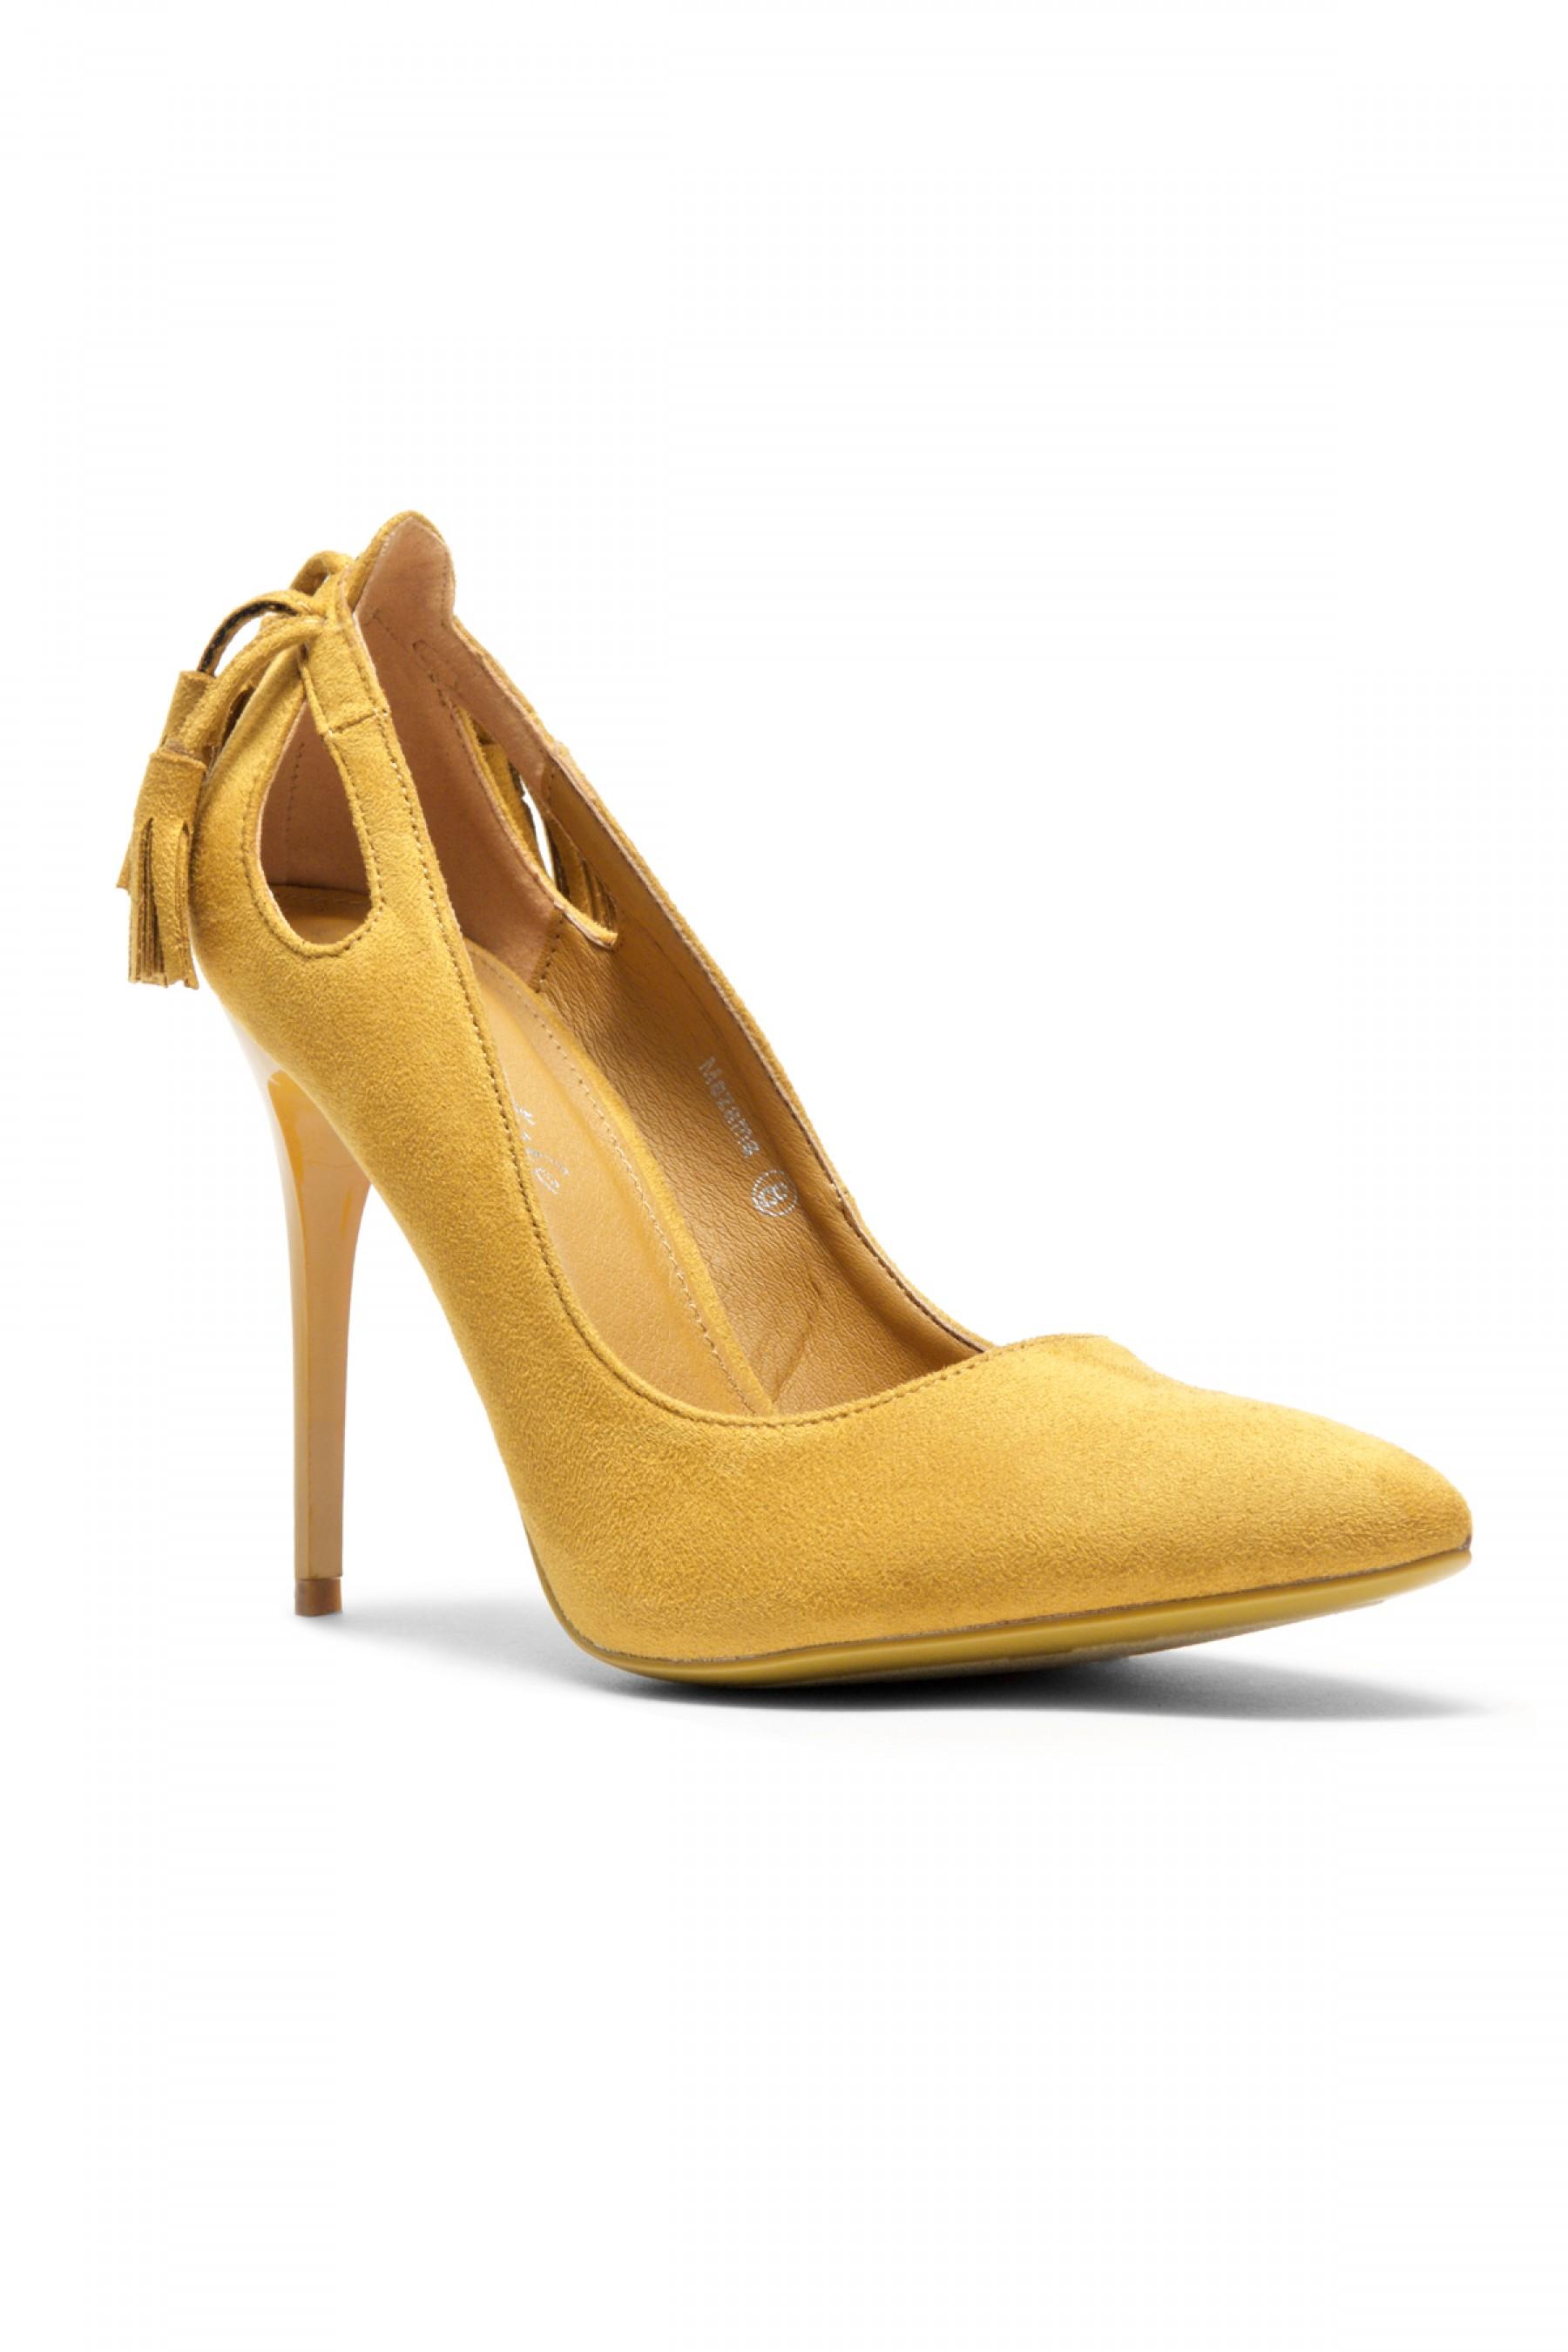 Women's Mustard Mazama 4-inch Pump Heel